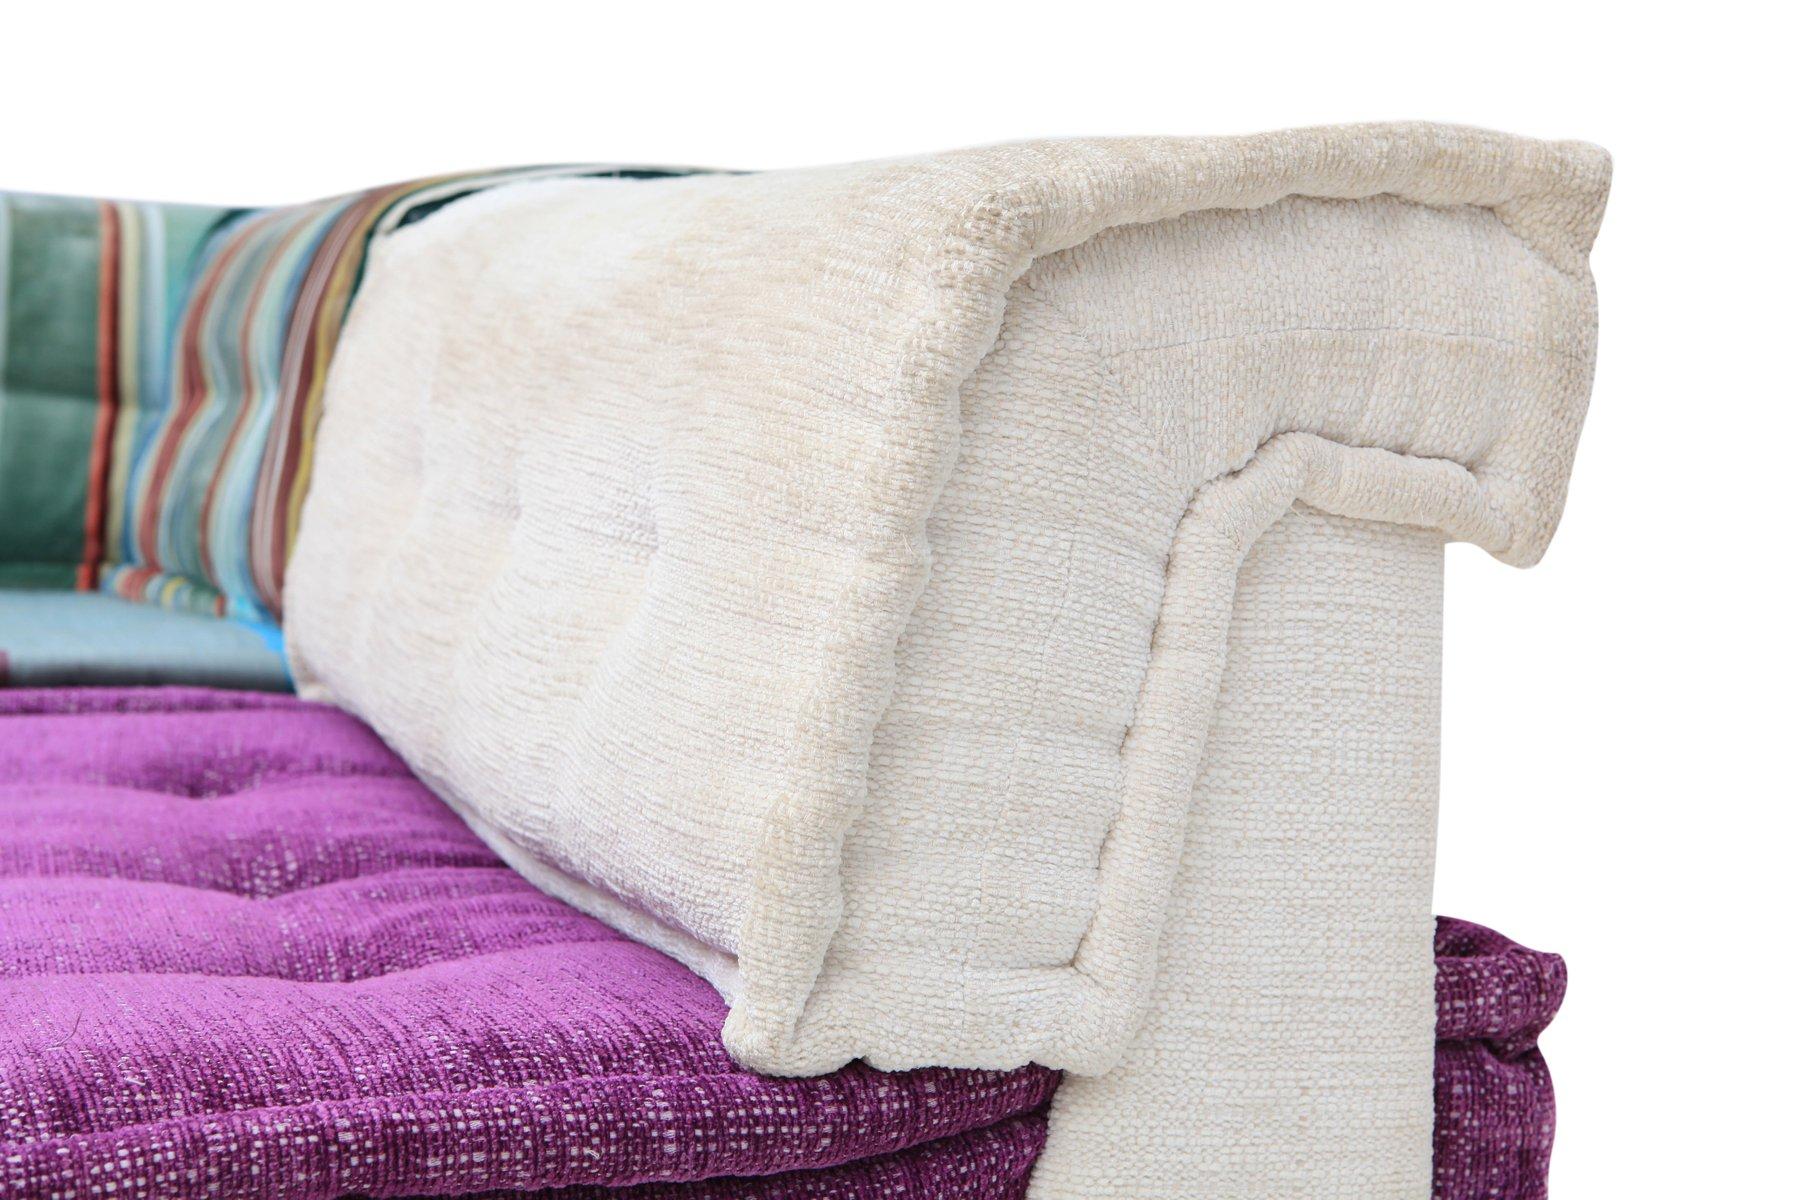 Mah Jong Sectional Corner Sofa By Hans Hopfer For Roche Bobois S For Sale At Pamono